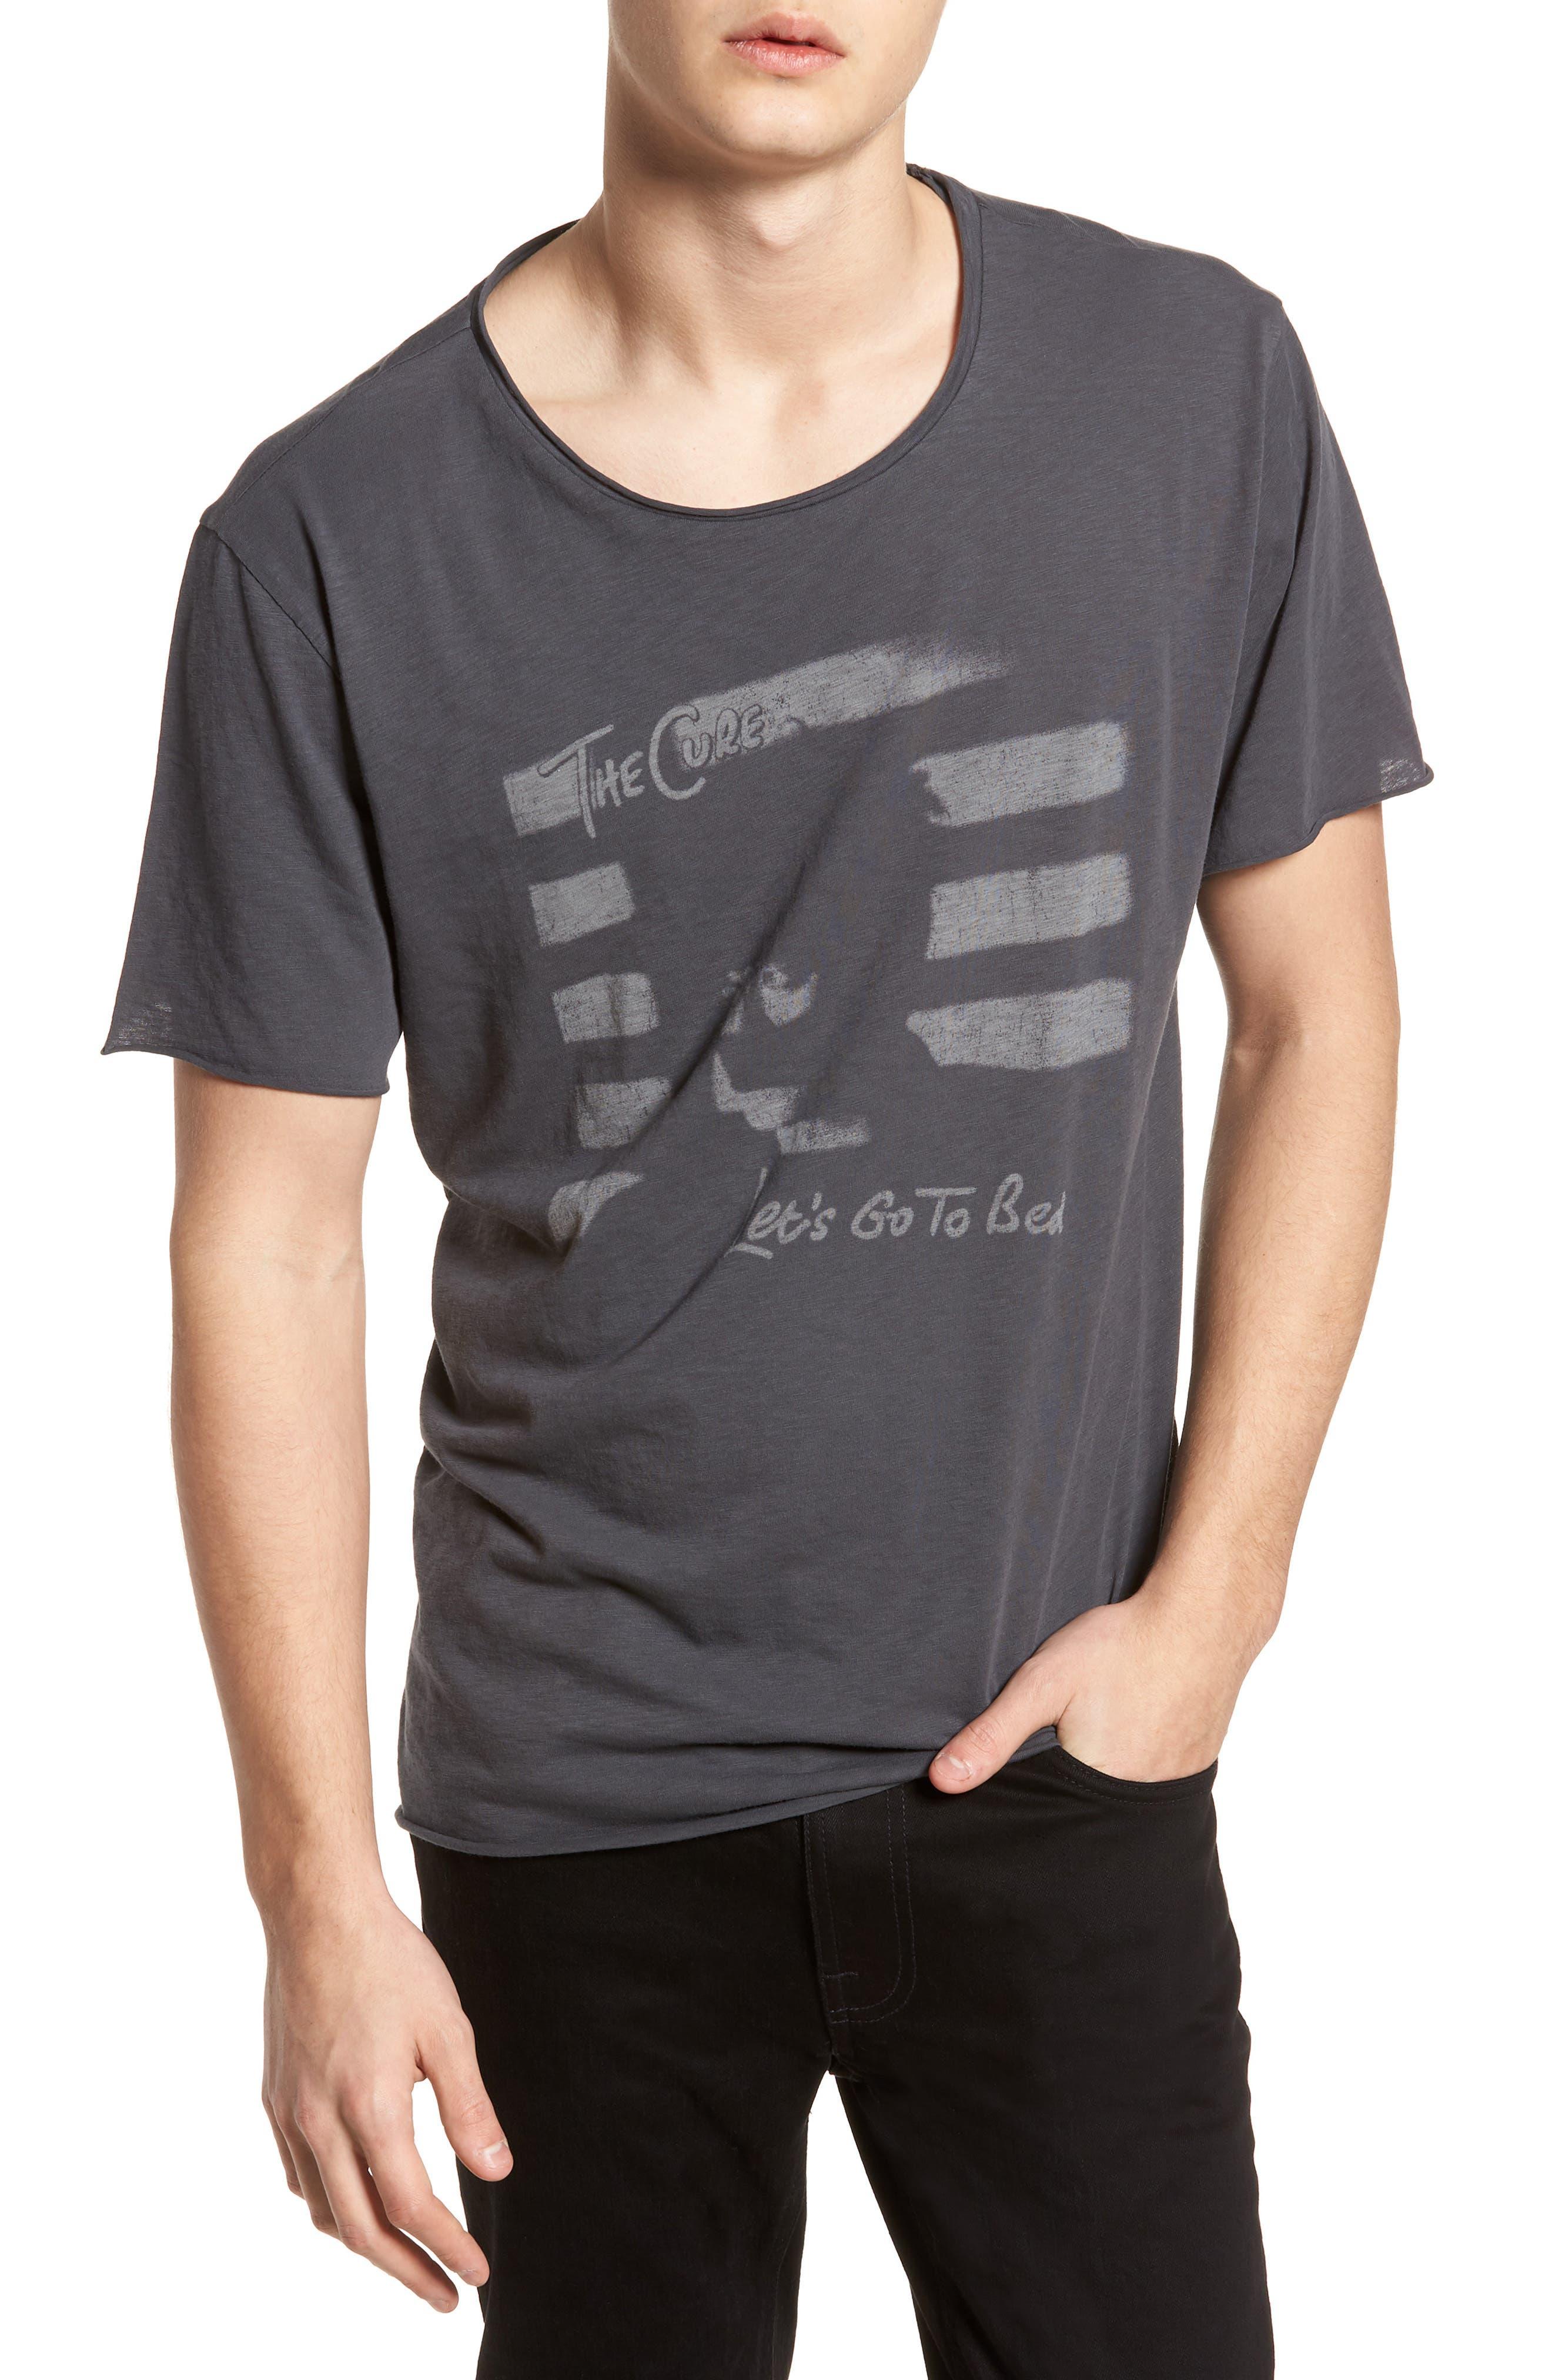 Treasure & Bond The Cure Crewneck T-Shirt